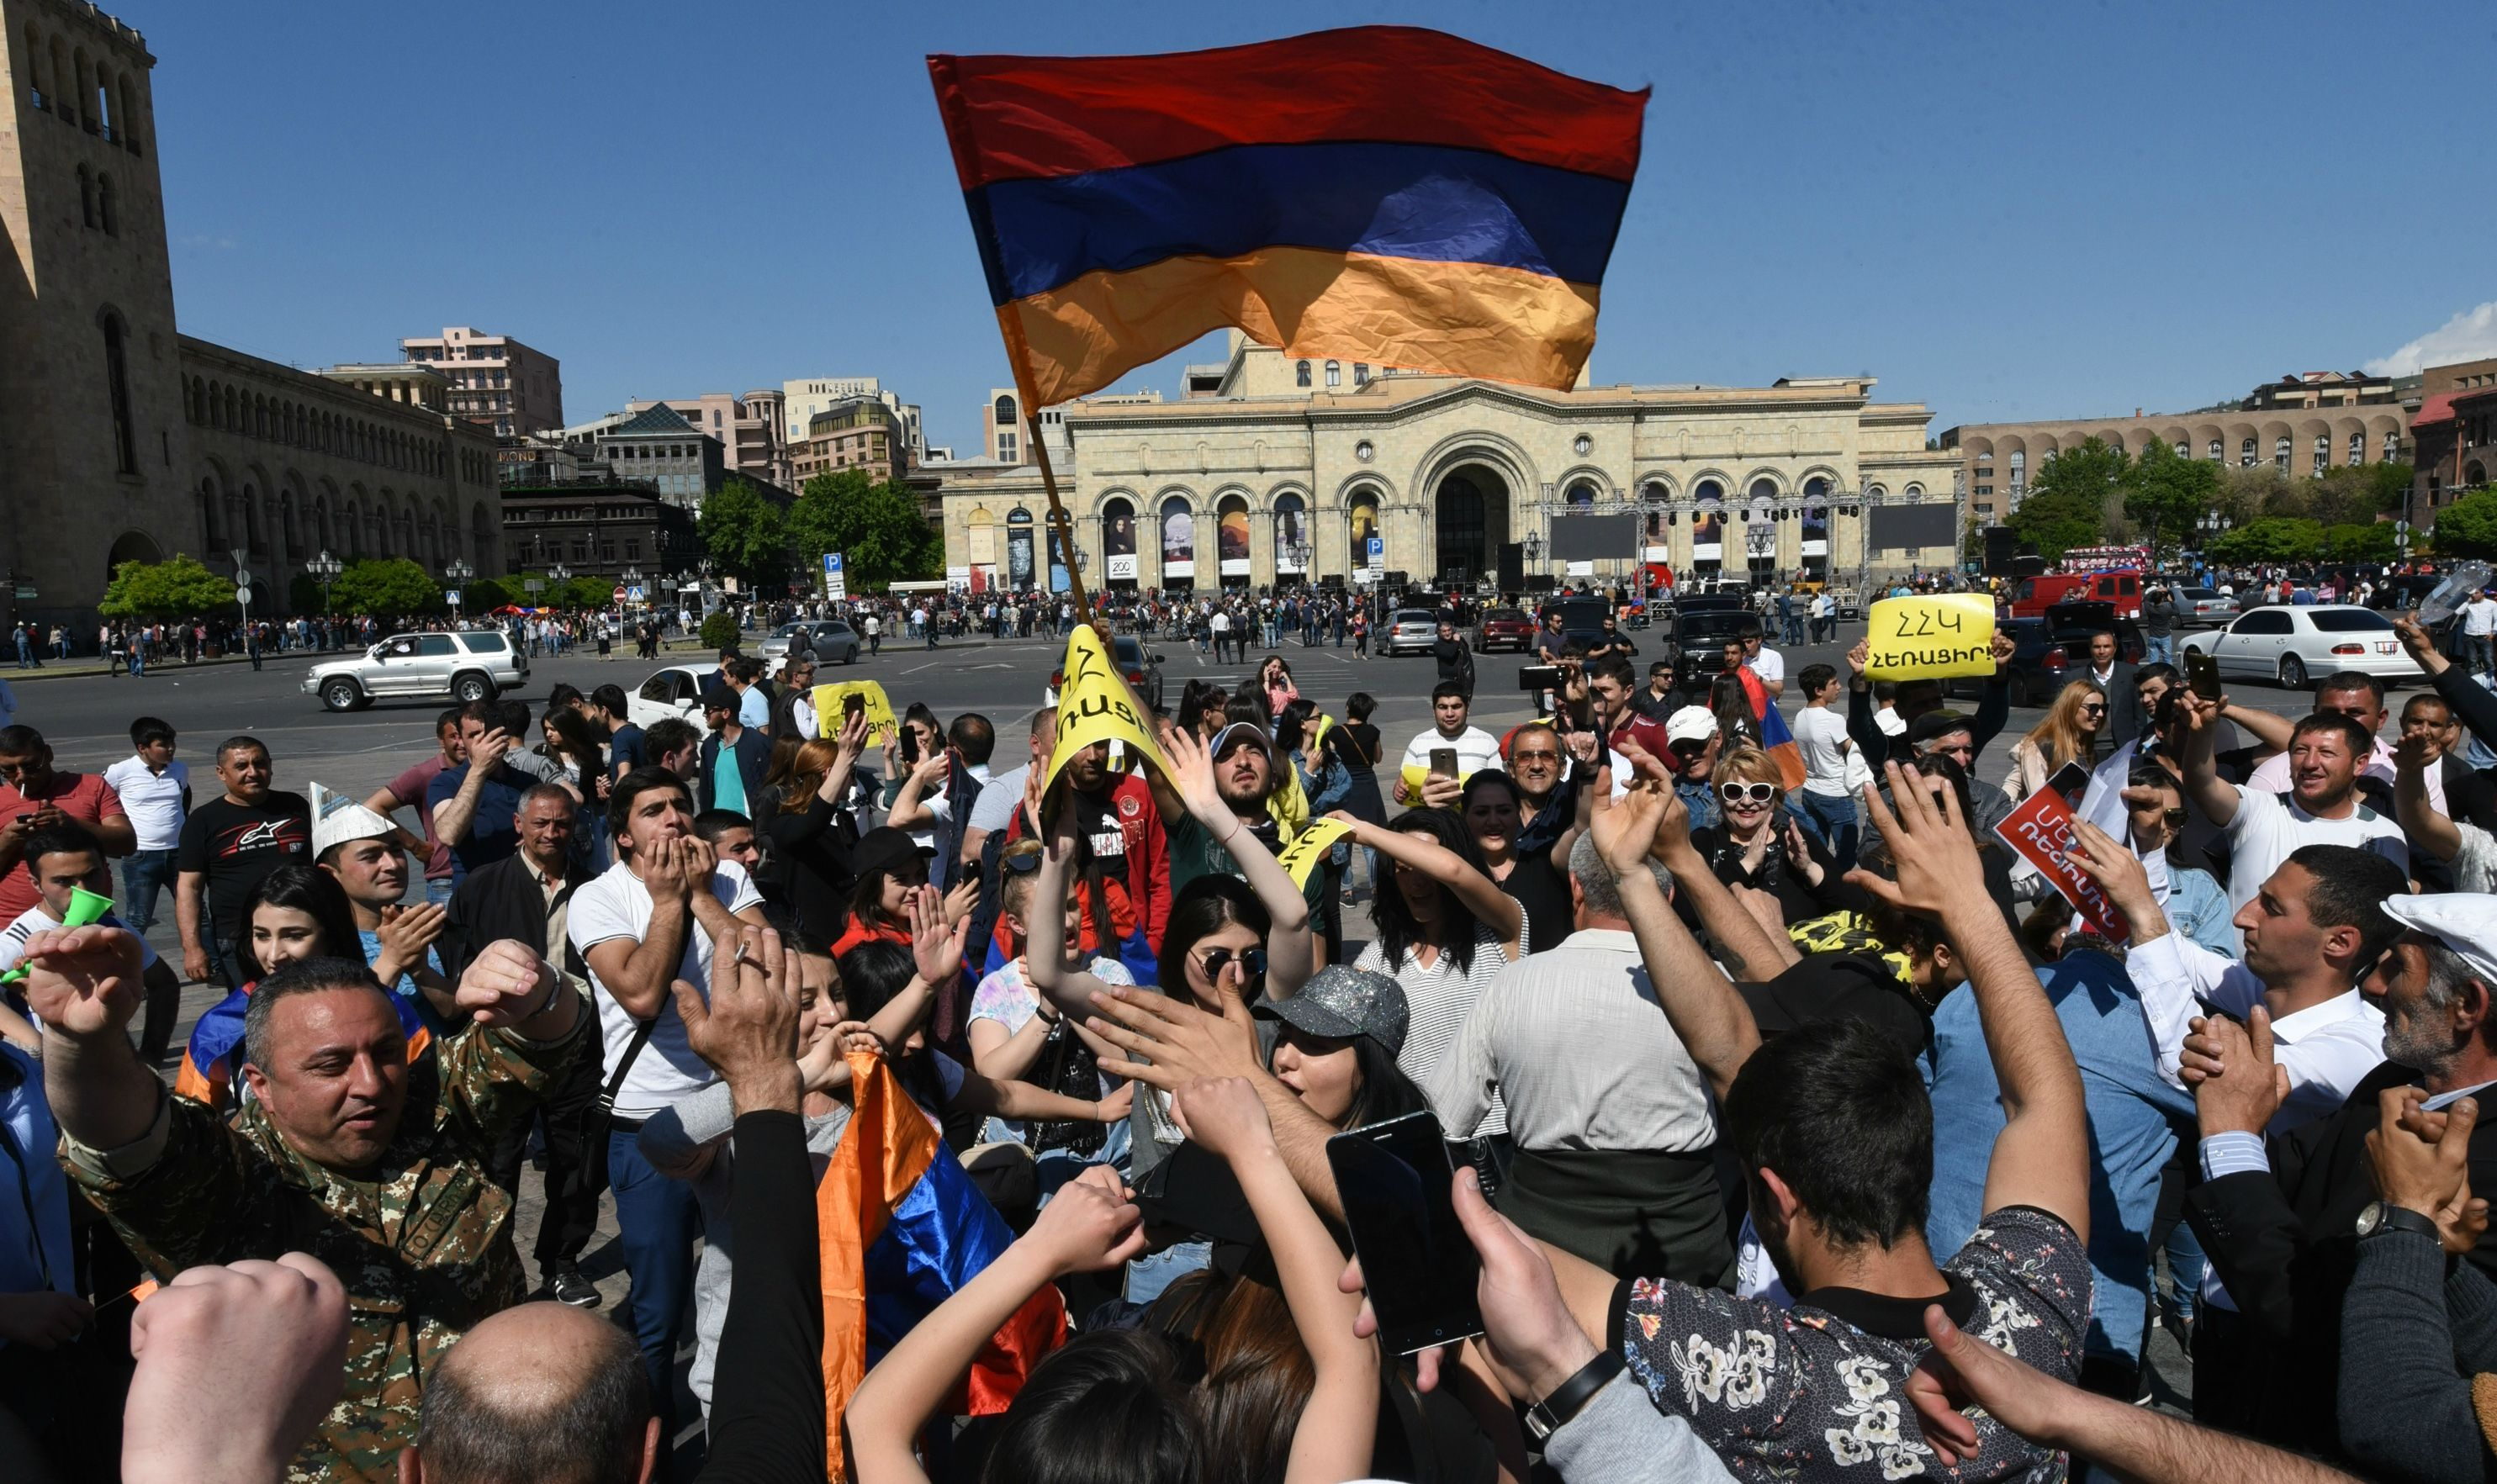 Armenian opposition supporters demonstrate in Yerevan on April 25, 2018. / AFP PHOTO / Vano SHLAMOV